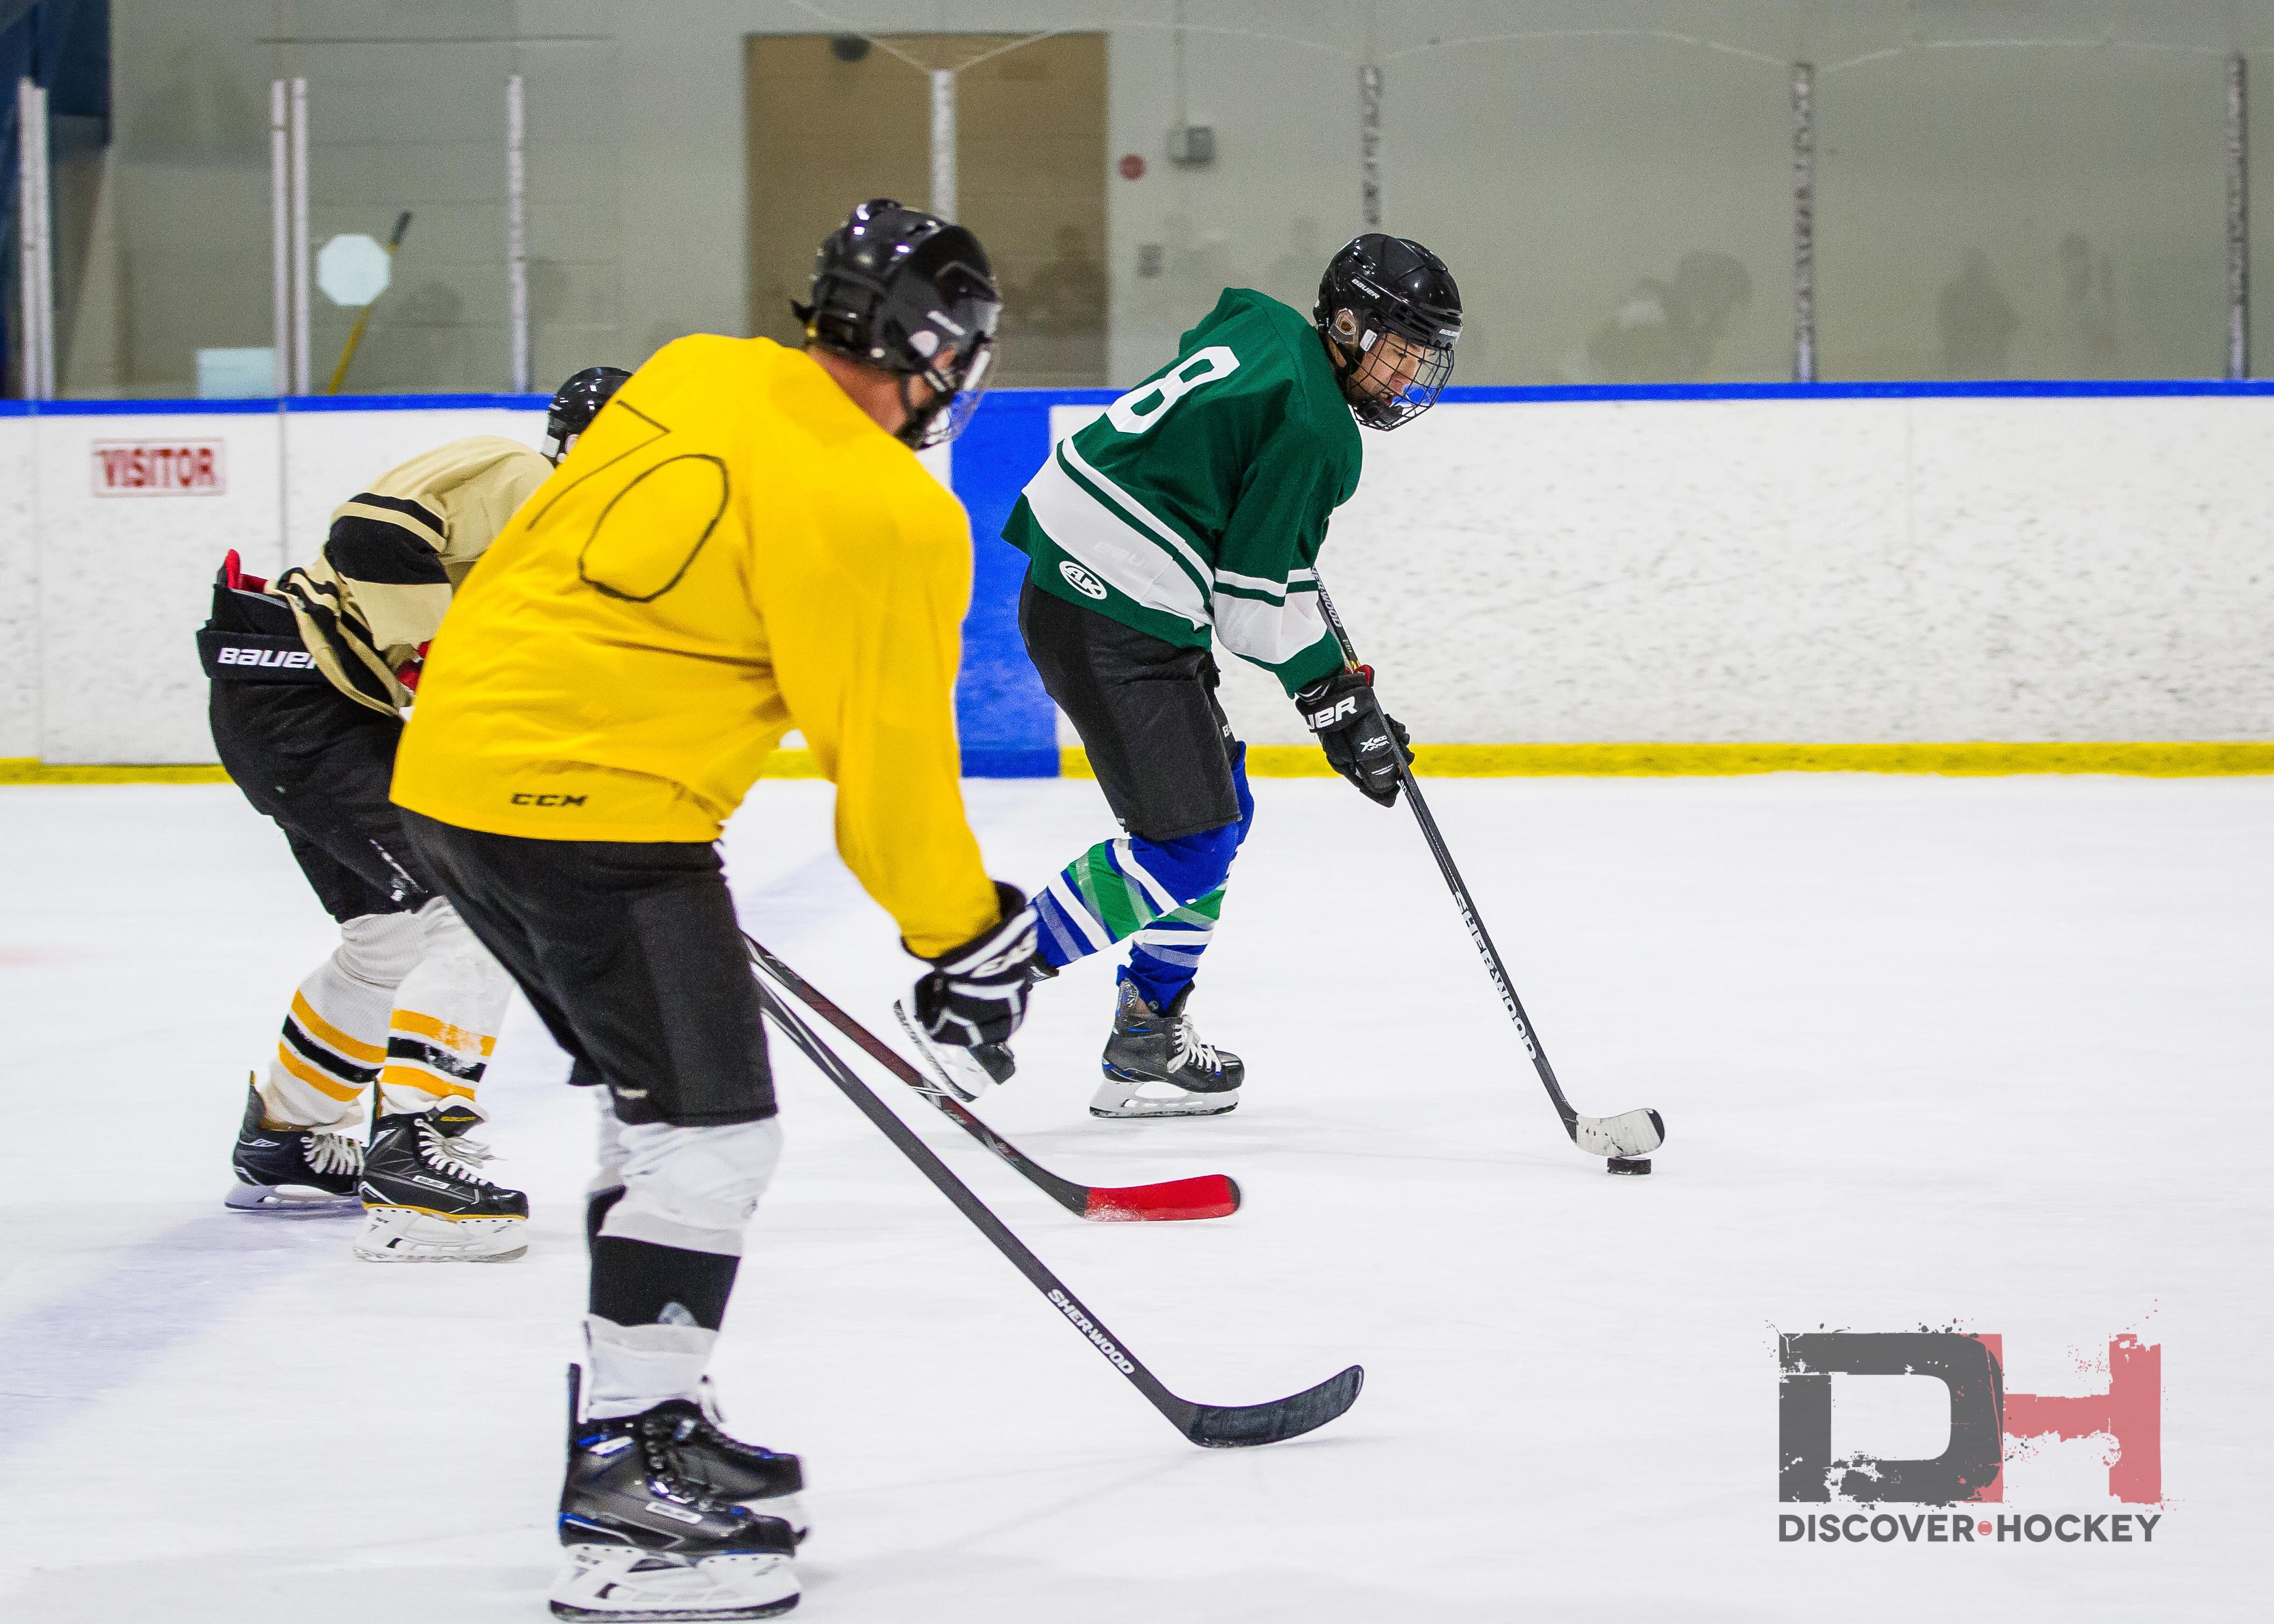 Femdom adult beginner hockey lil